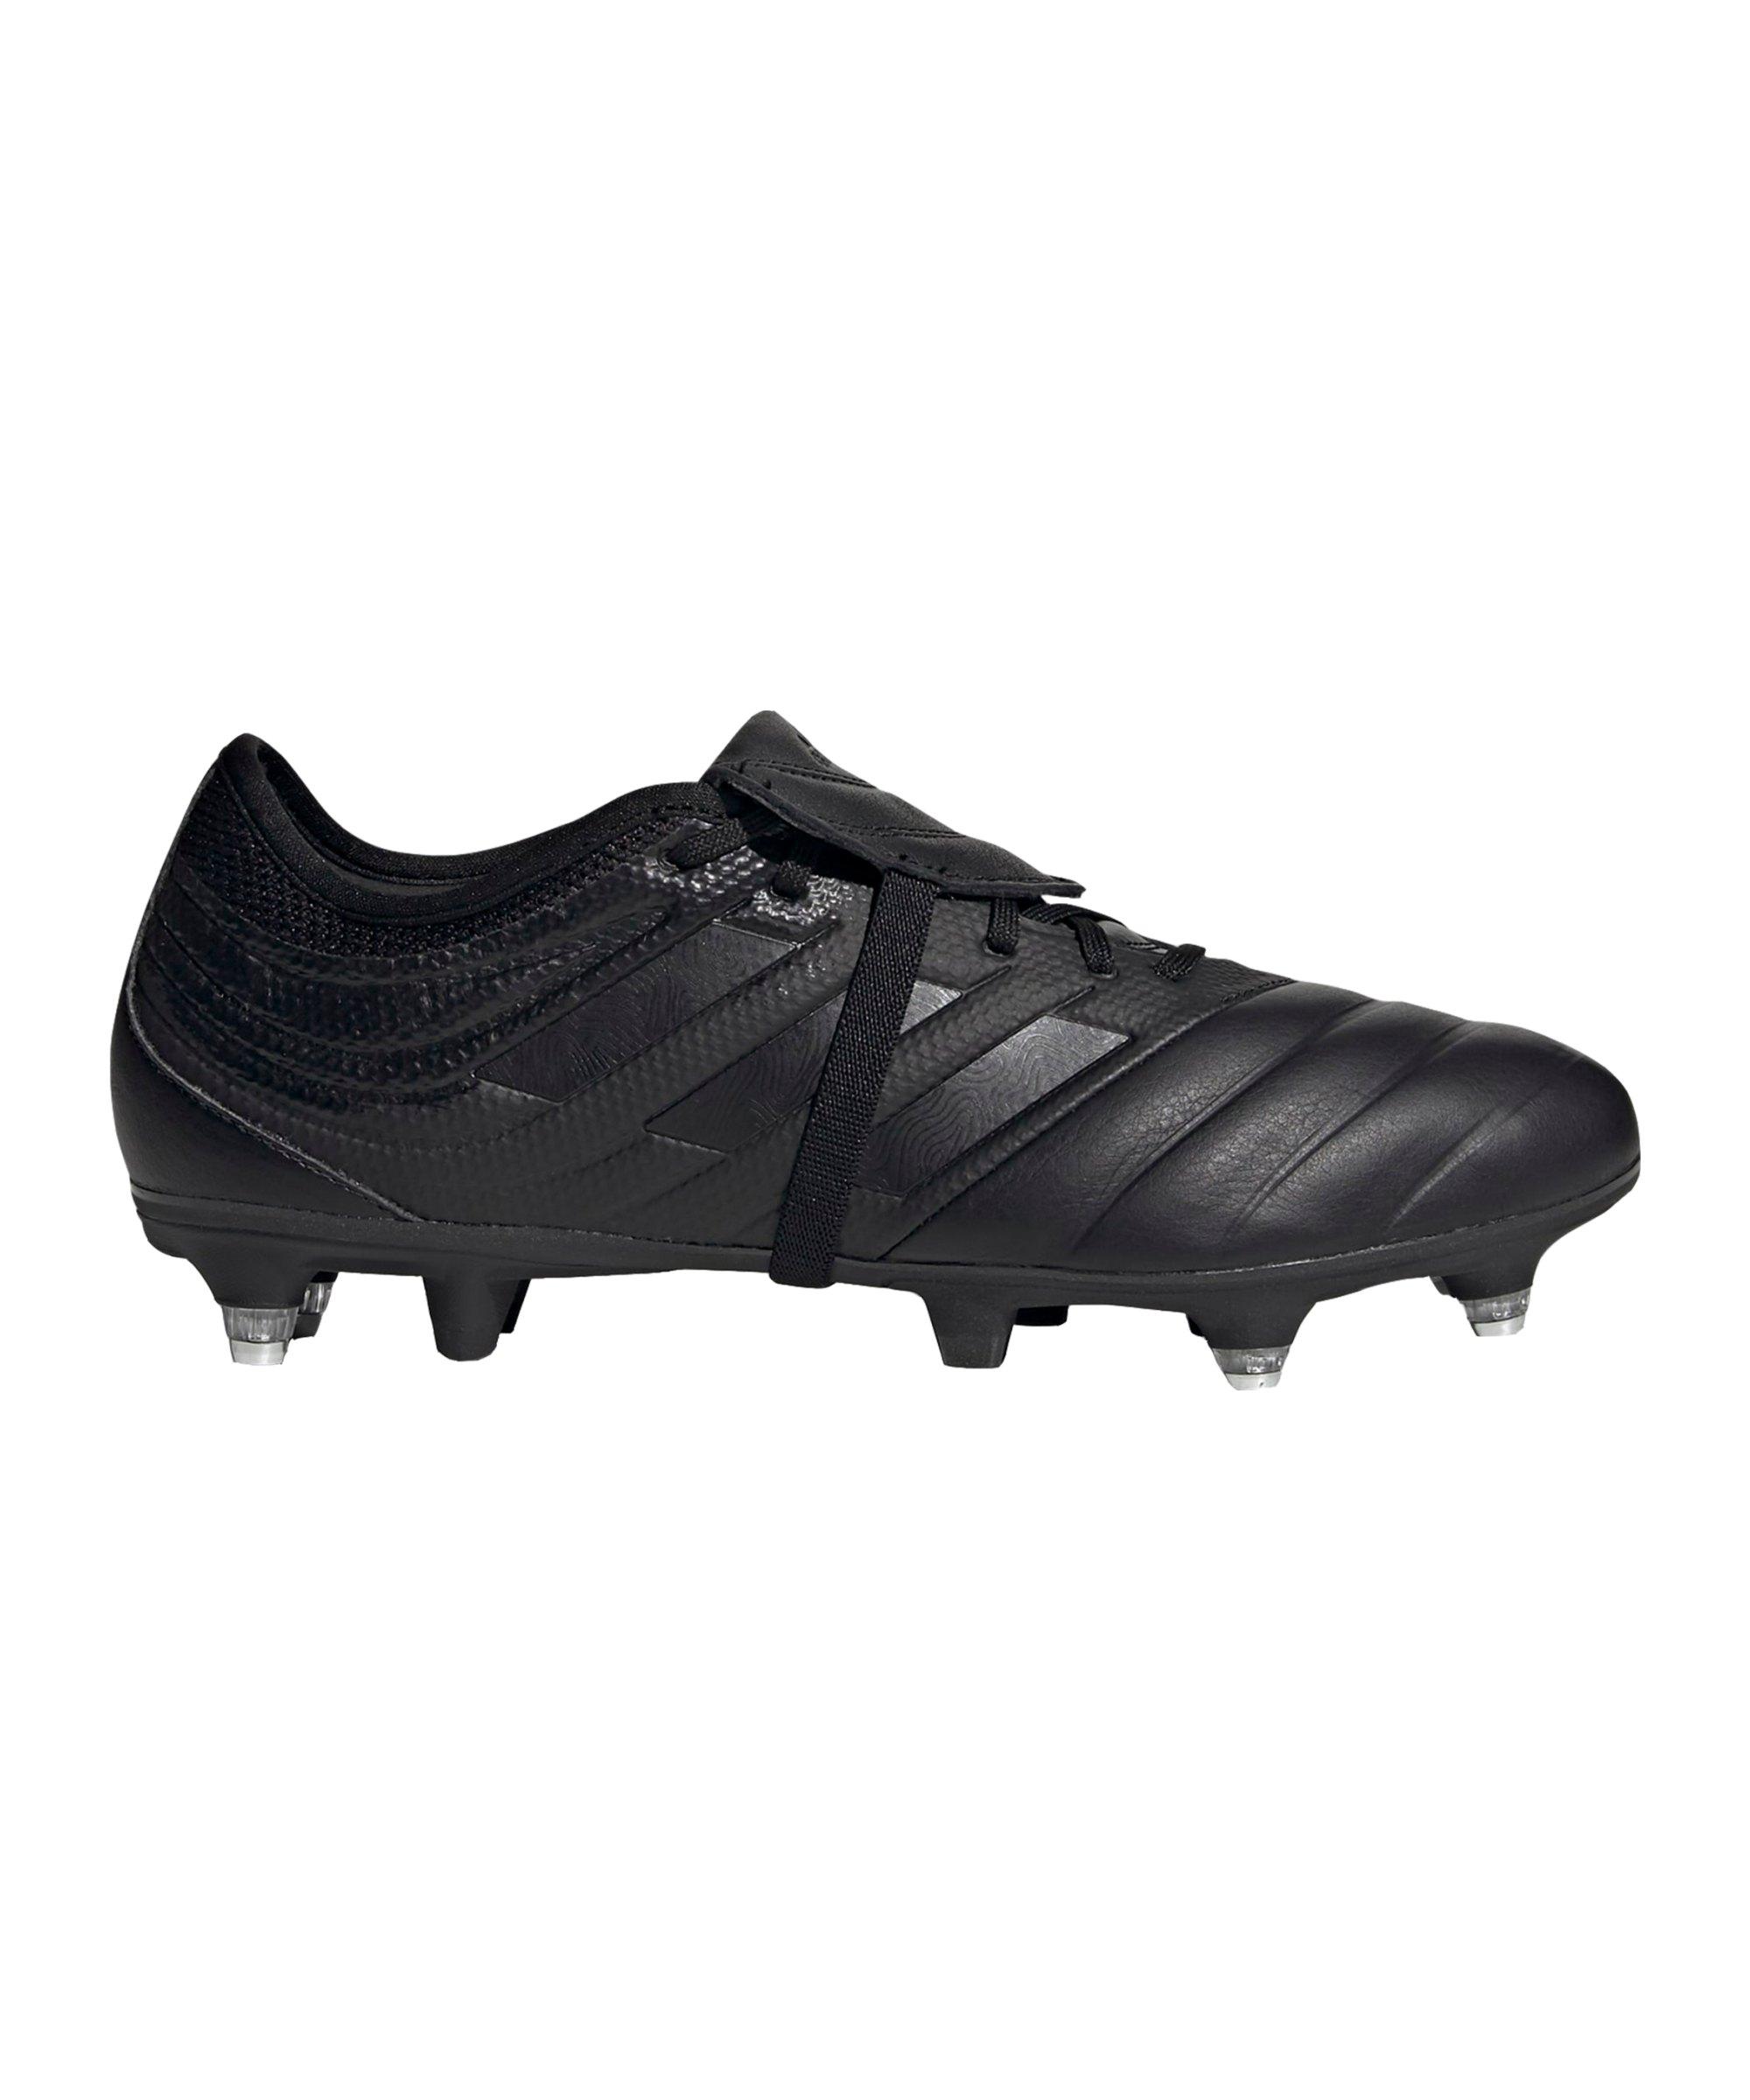 adidas COPA Gloro Dark Motion 20.2 SG Schwarz Grau - schwarz